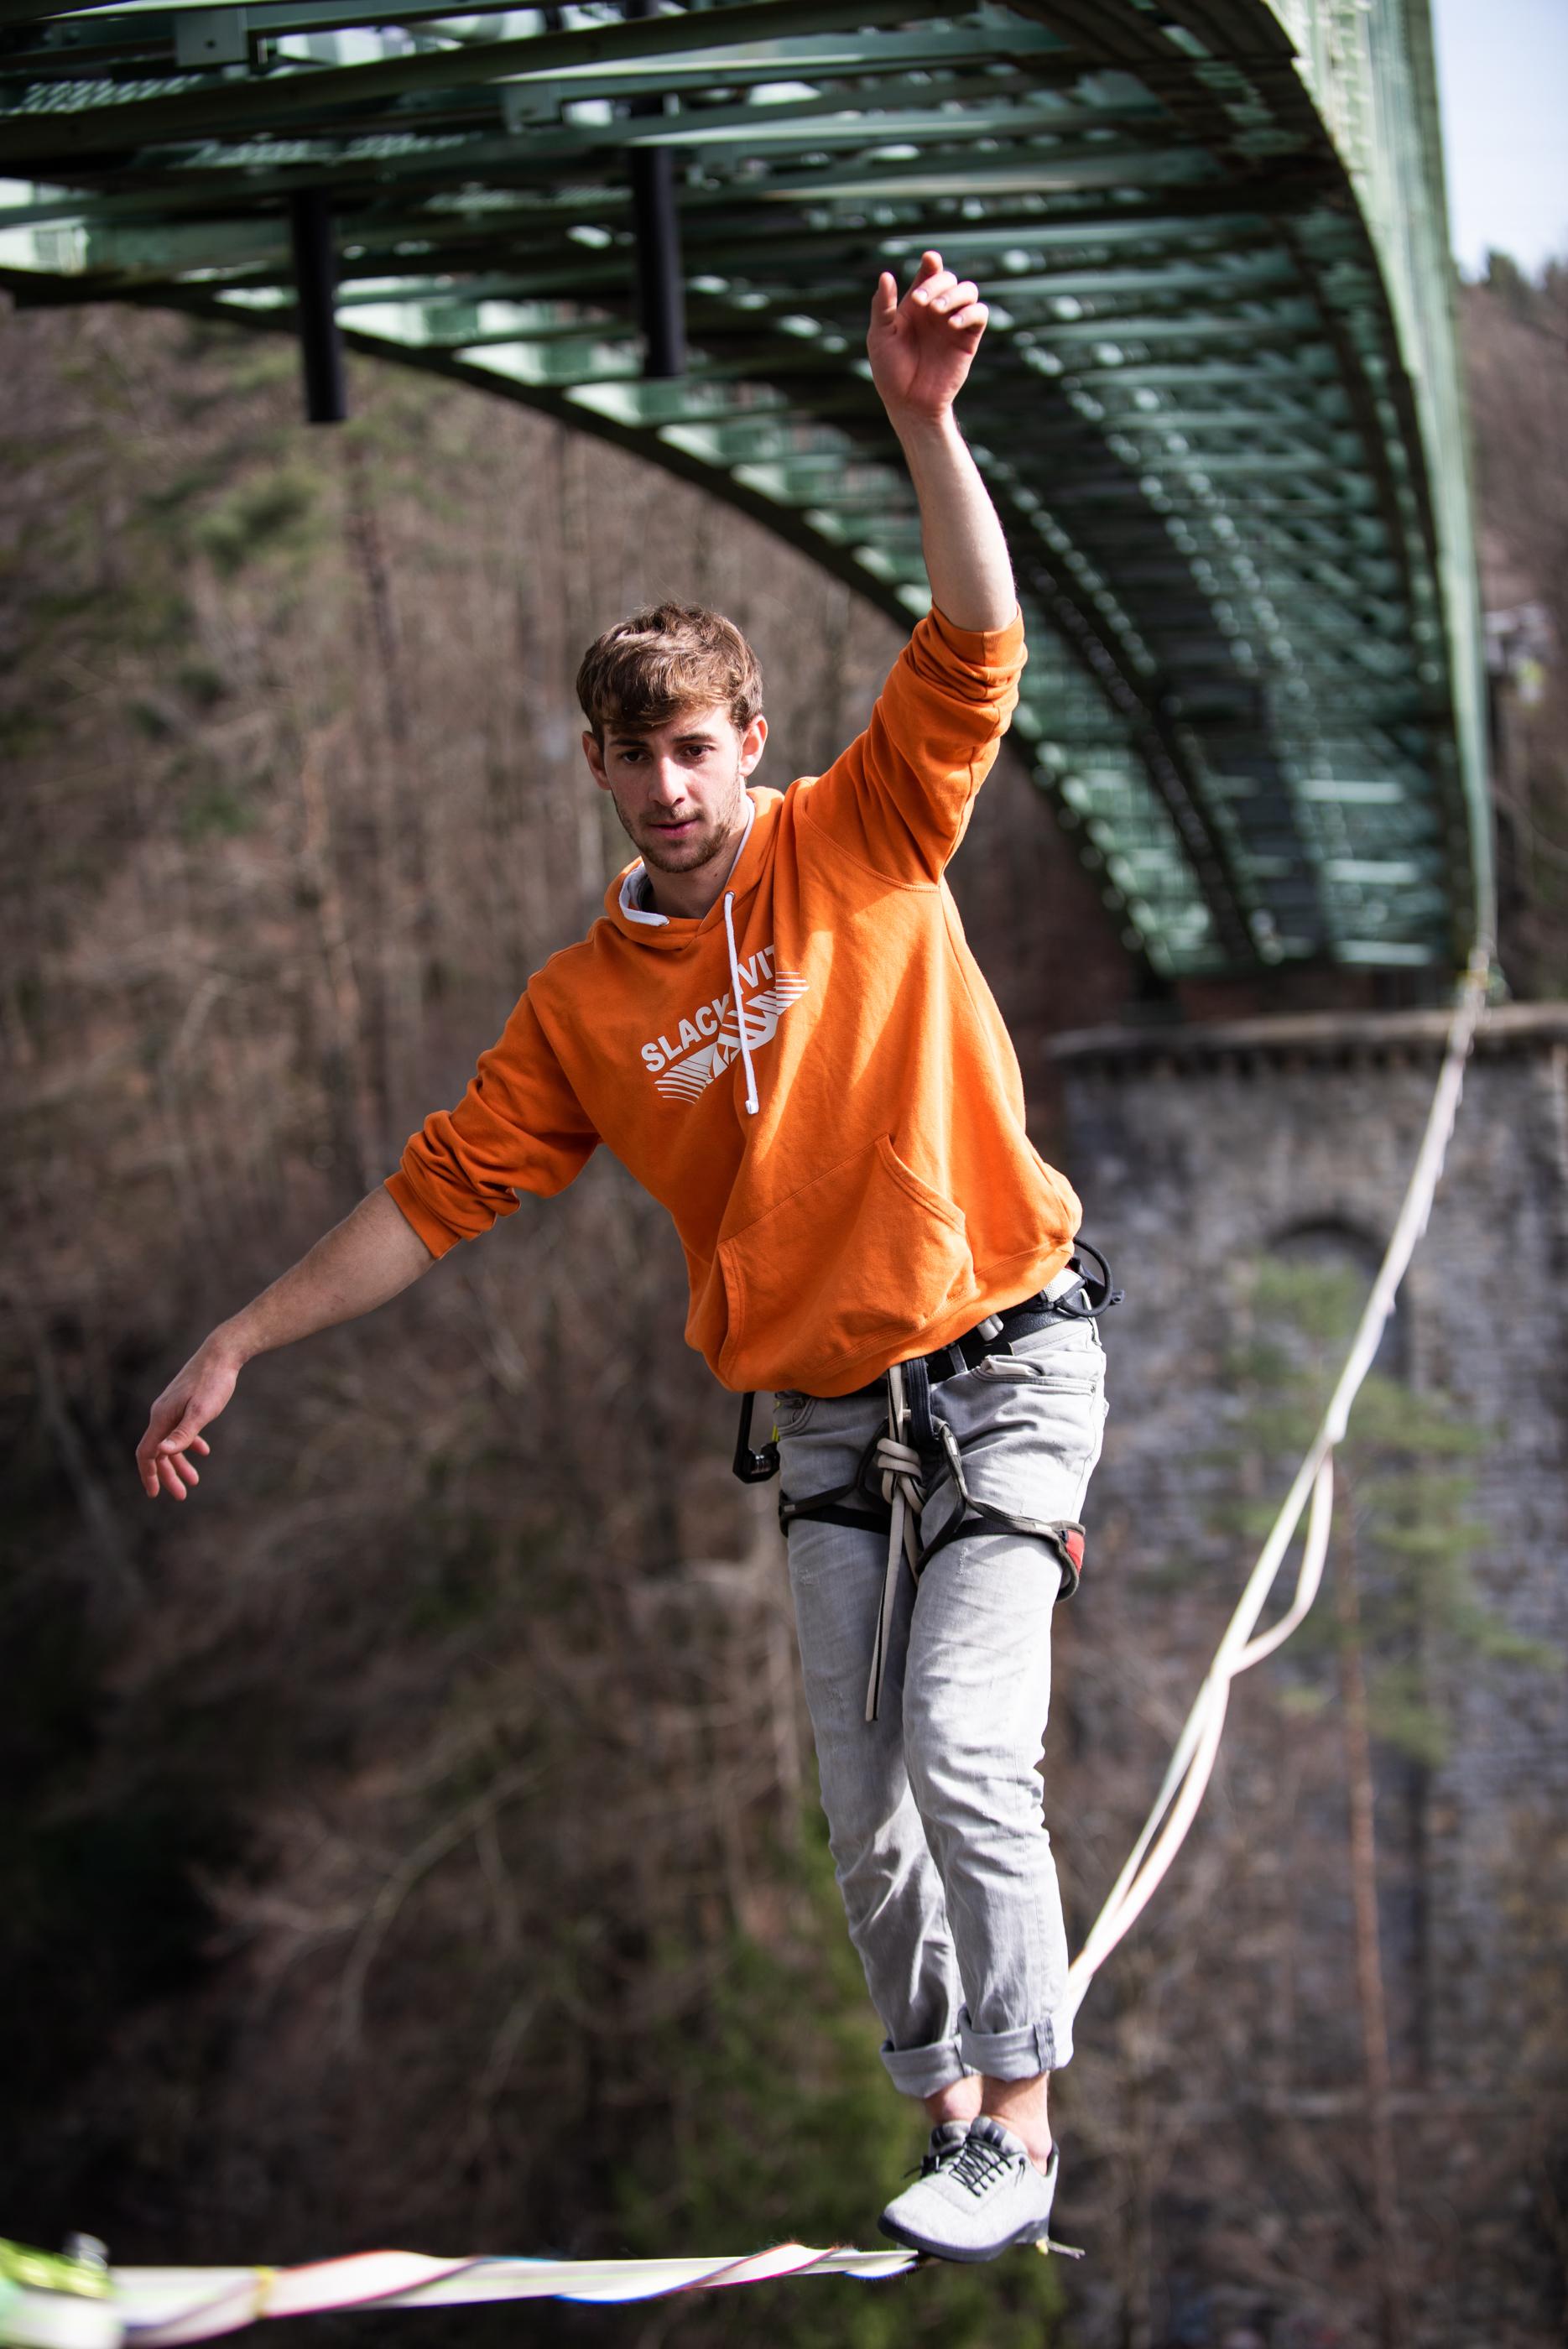 Baabuk, chaussure, laine,  Vevey, Suisse, Slackline Lyell Grunberg show performance spectacle Highline trickline (18).jpg